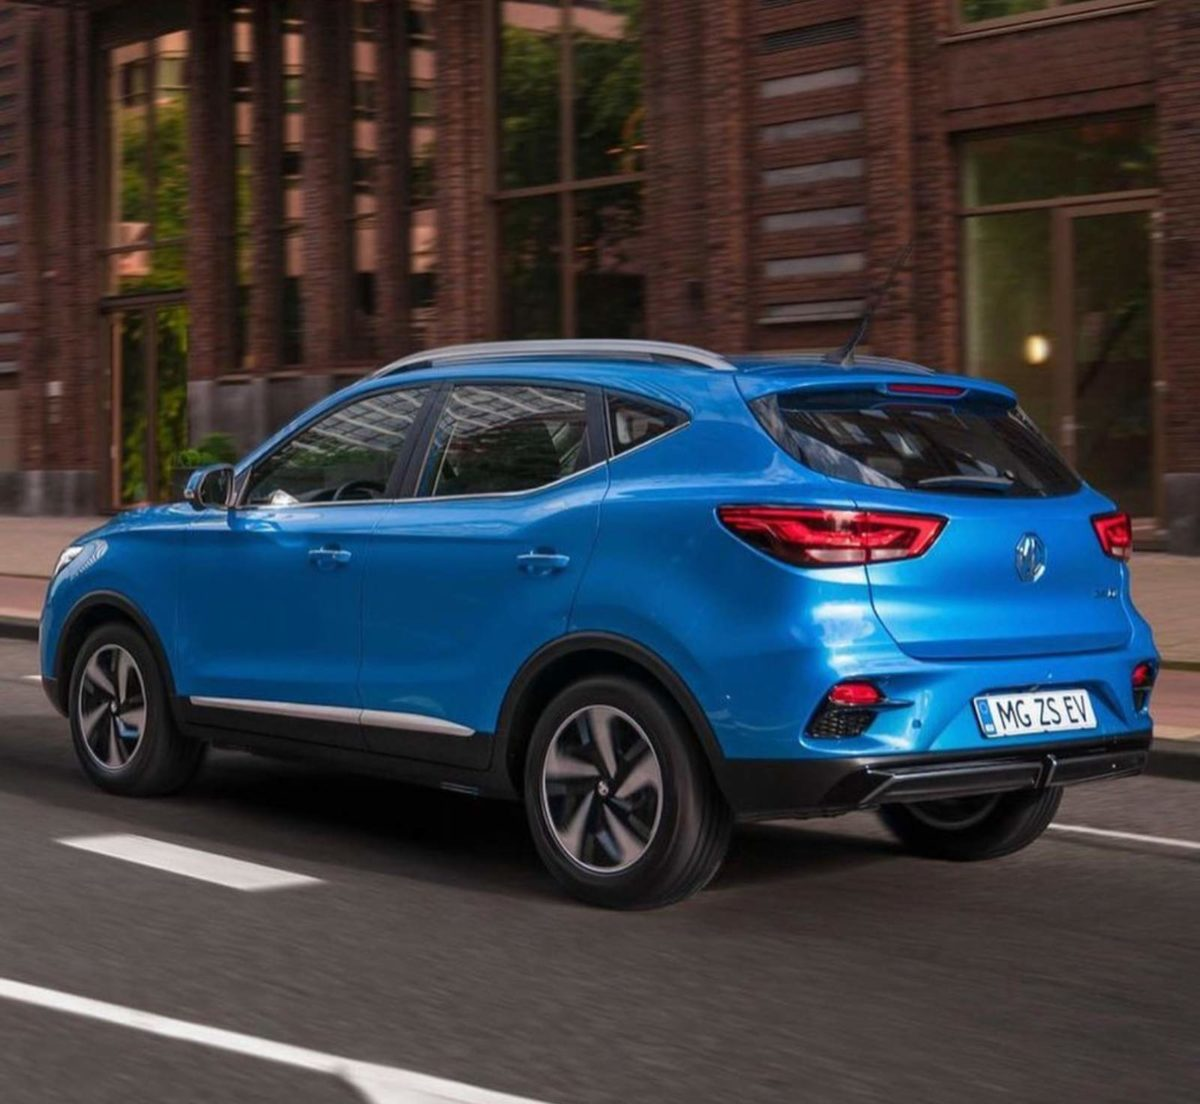 mg zs ev facelift rear (1)